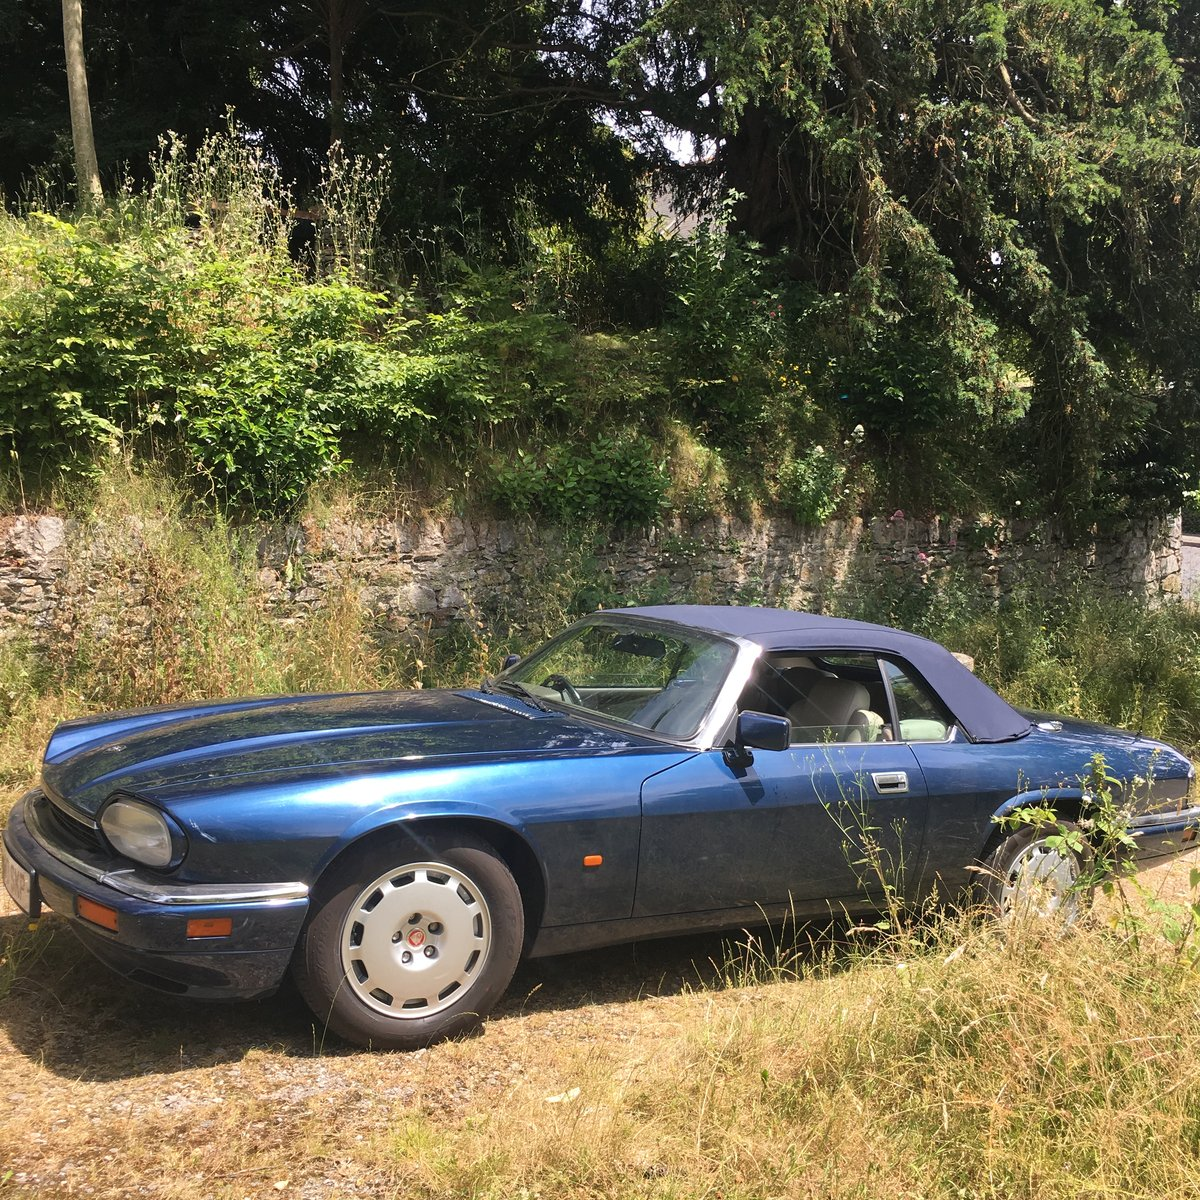 1995 Jaguar xjs Convertible For Sale (picture 1 of 6)